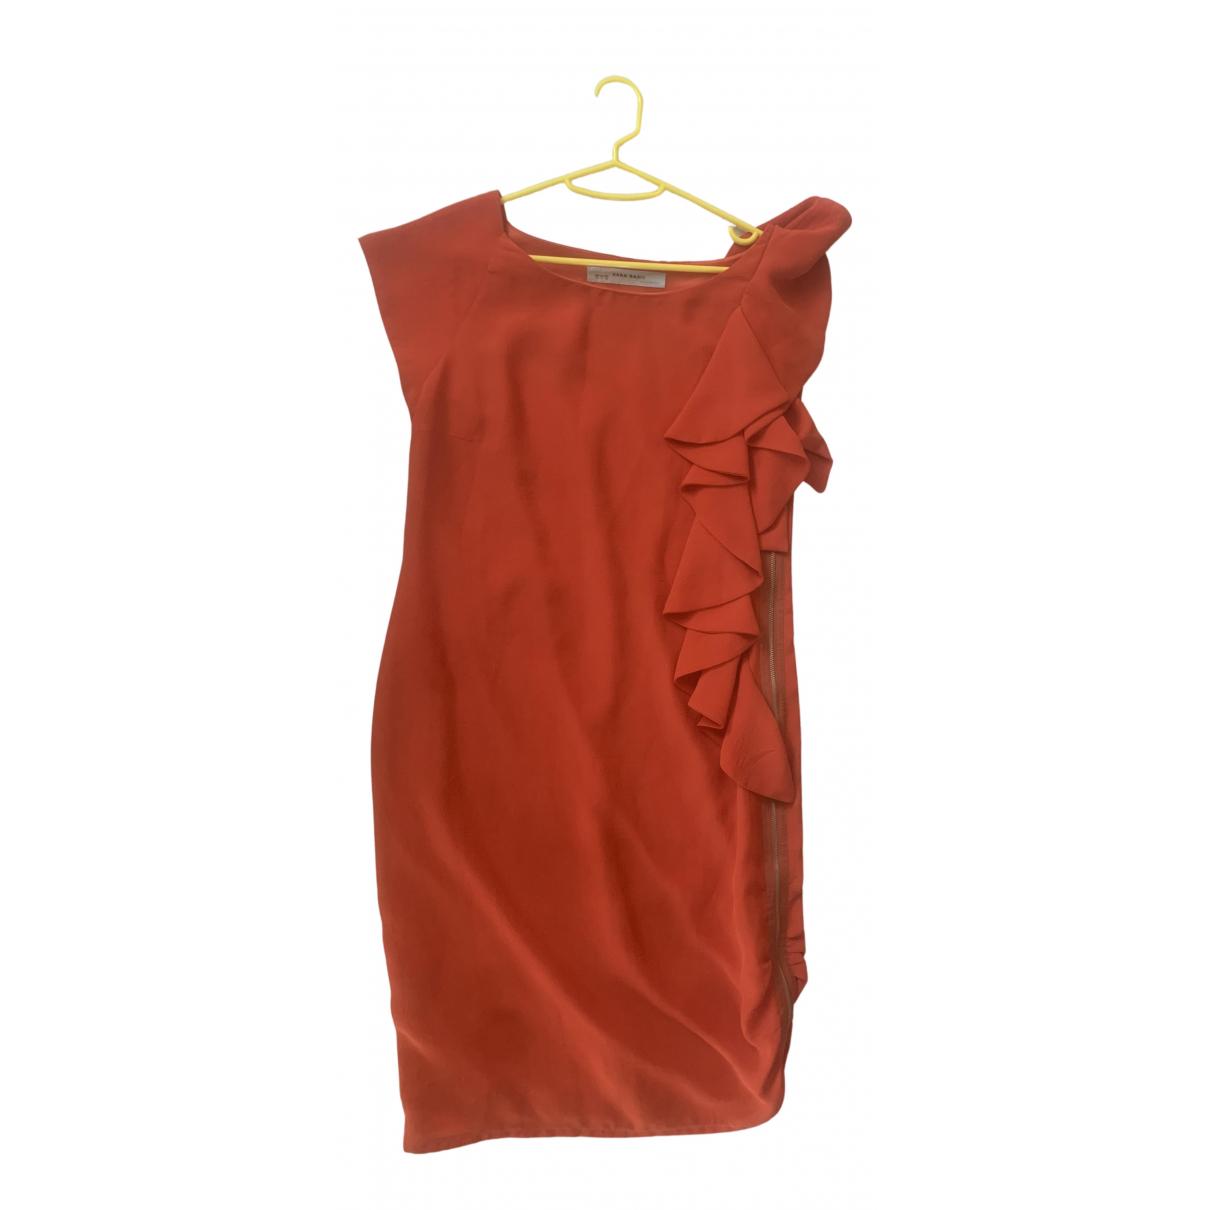 Zara - Robe   pour femme en cachemire - orange